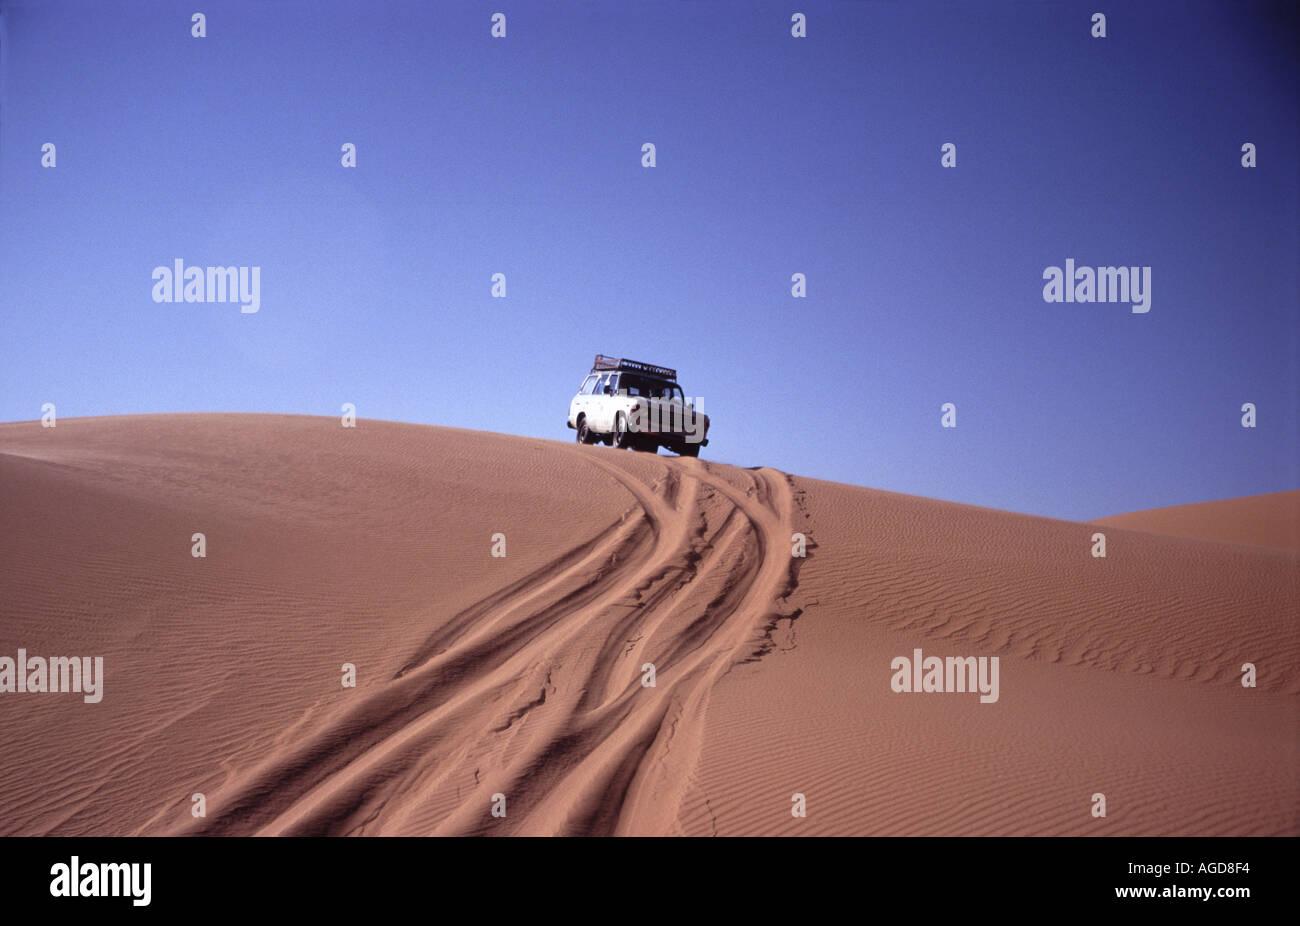 Libya Libyen Desert Sahara Jeep Jeeptour offroad driving dunes fourwheeldrive adventure crossing the desert no street - Stock Image